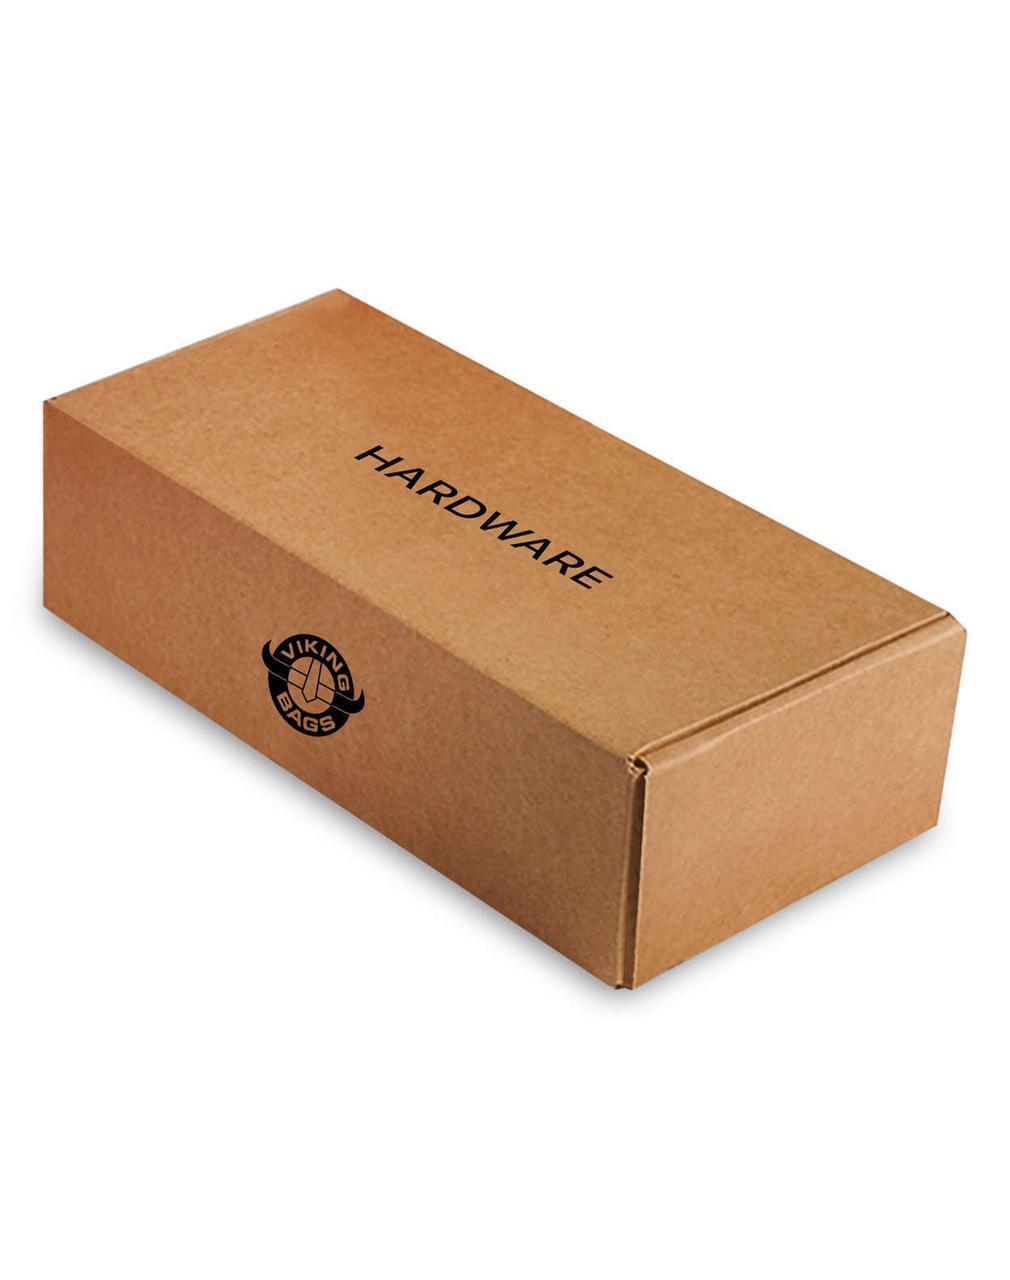 Honda 1100 Shadow Aero Slant Medium Motorcycle Saddlebags Box